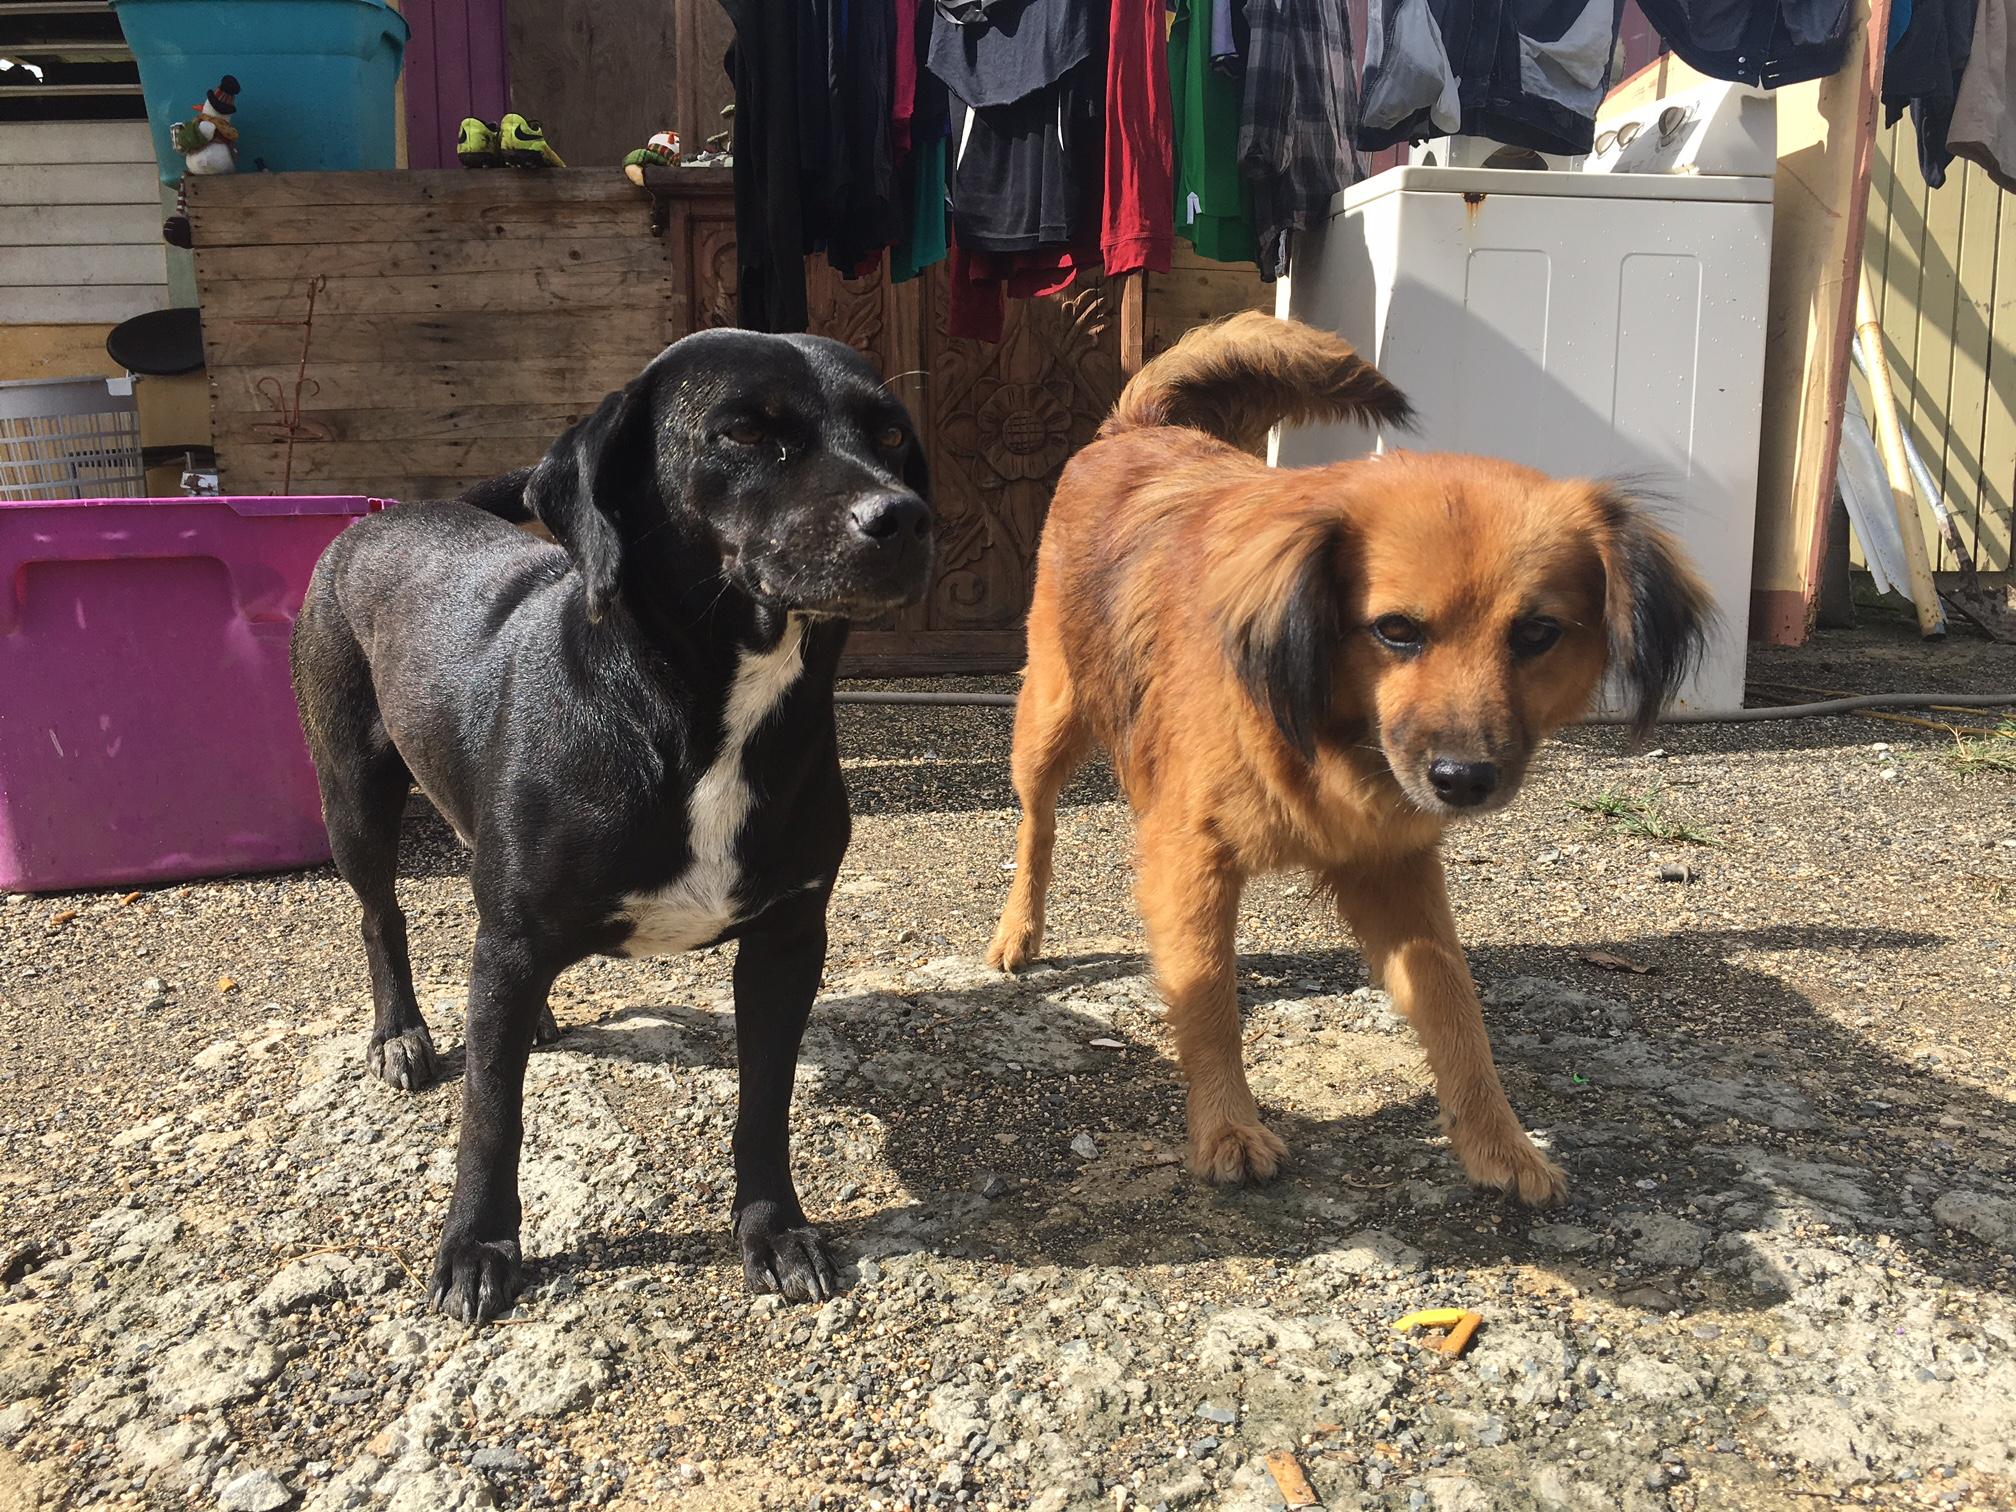 <div class='meta'><div class='origin-logo' data-origin='WLS'></div><span class='caption-text' data-credit=''>Dogs in Villa Esperanza, Puerto Rico</span></div>